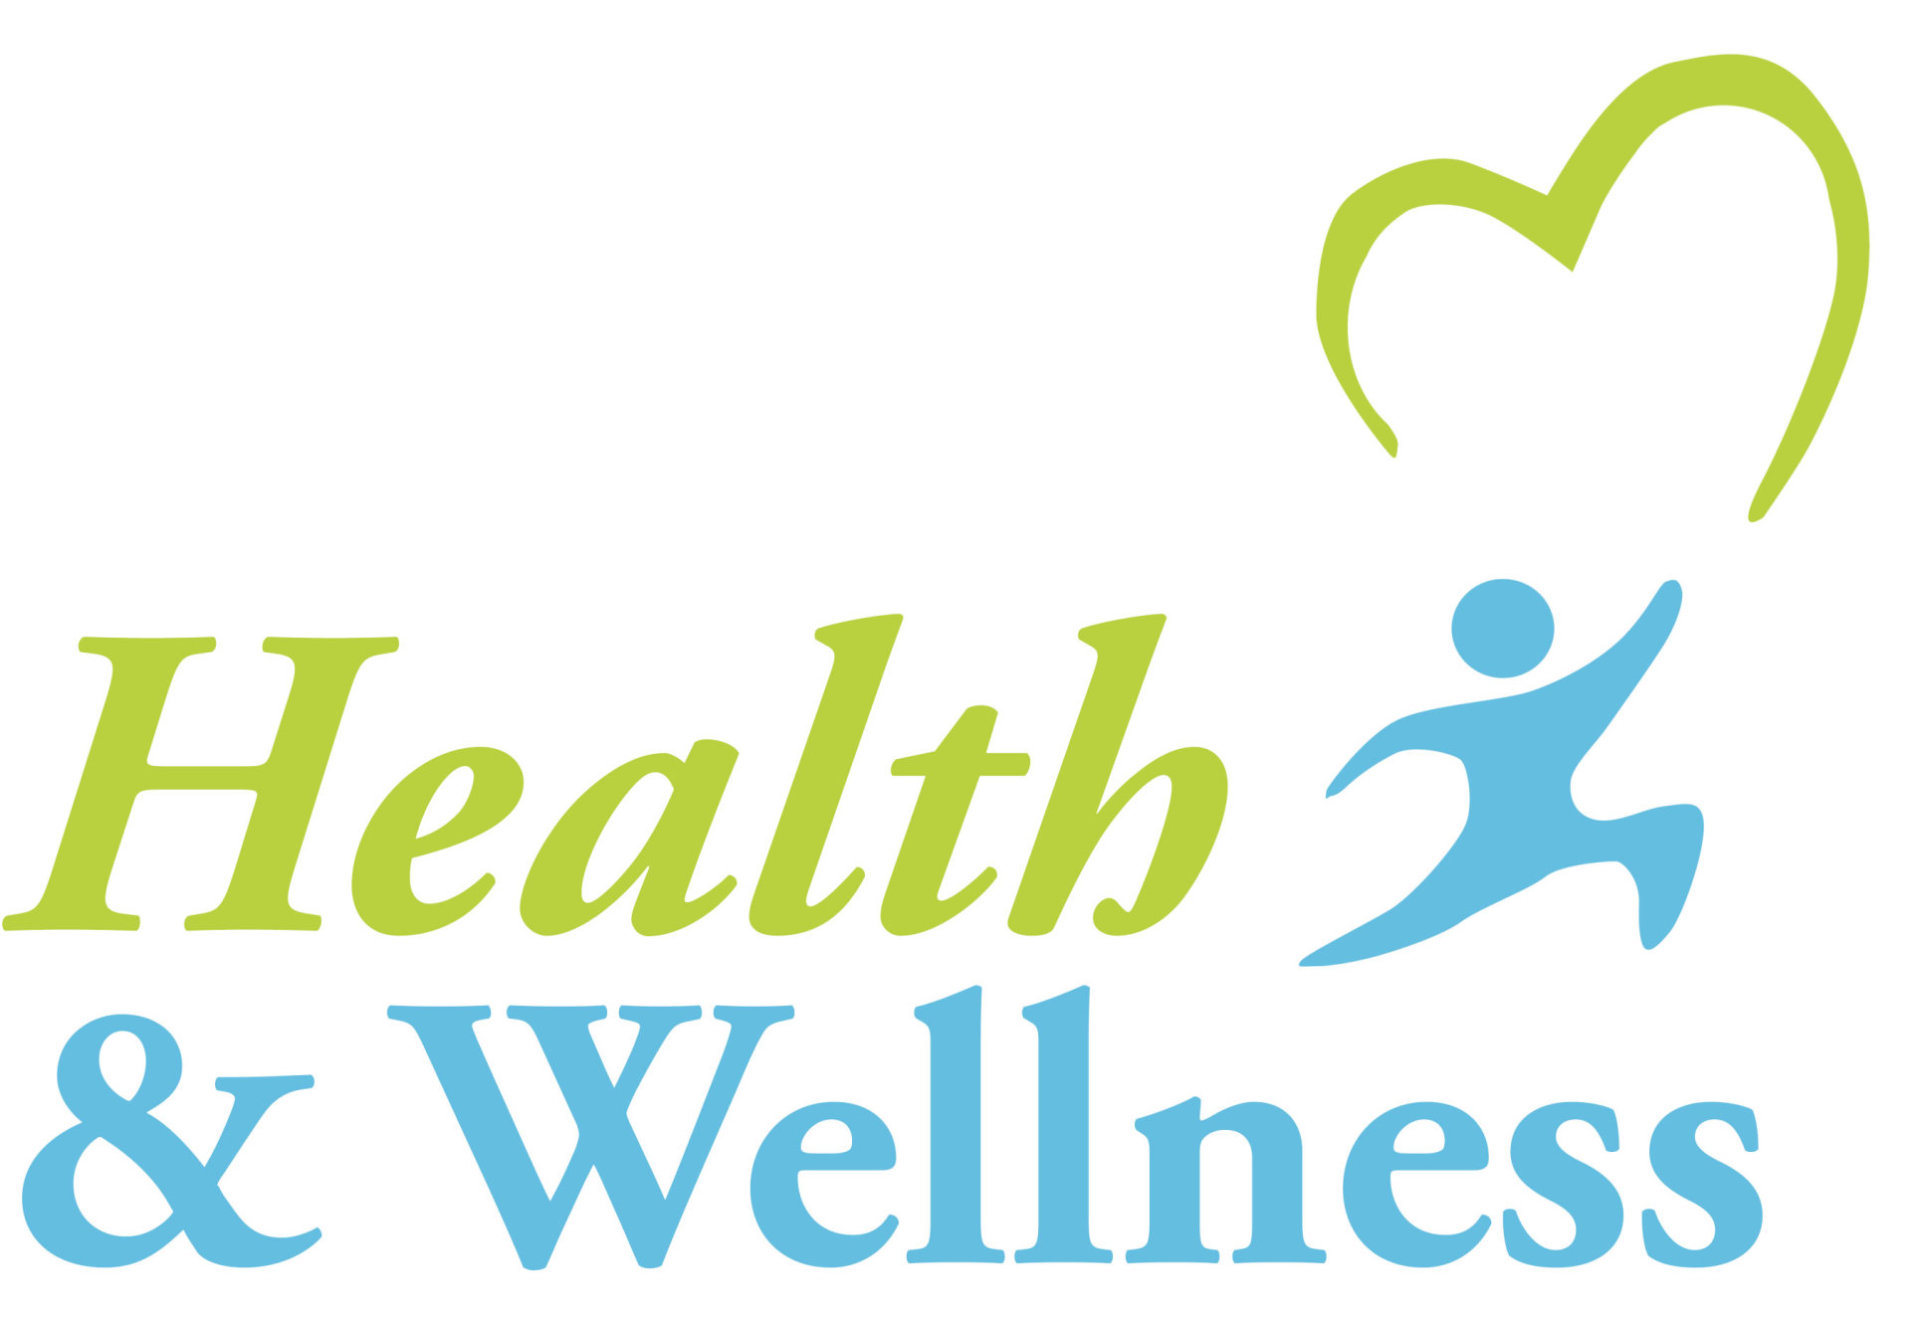 health and wellness logos rh logolynx com health and wellness logos images